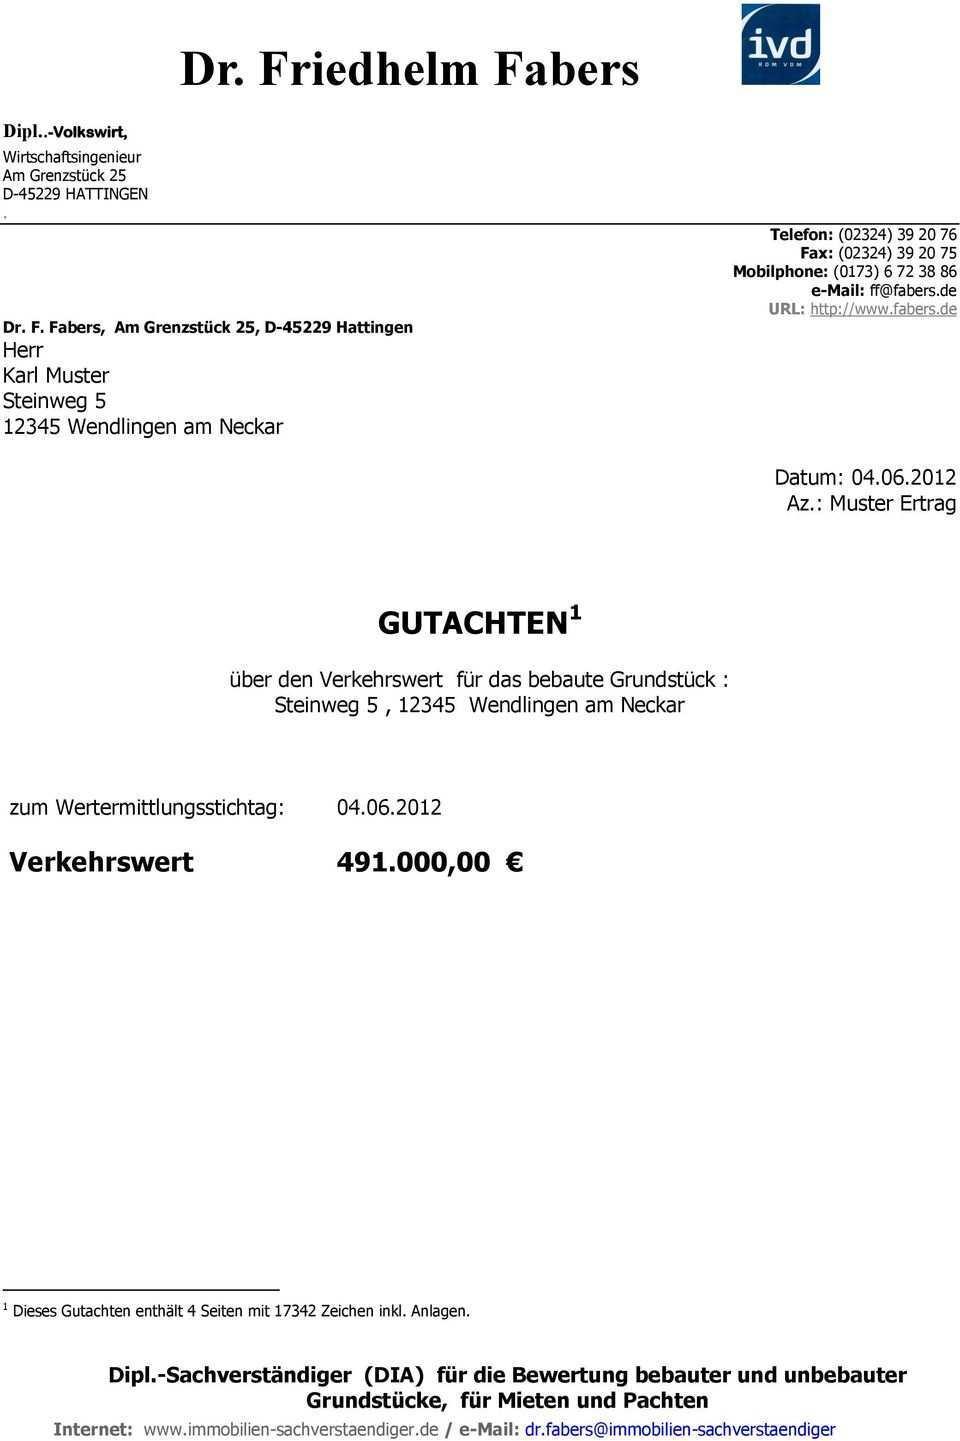 Gutachten 1 Uber Den Verkehrswert Fur Das Bebaute Grundstuck Steinweg 5 Wendlingen Am Neckar Pdf Free Download